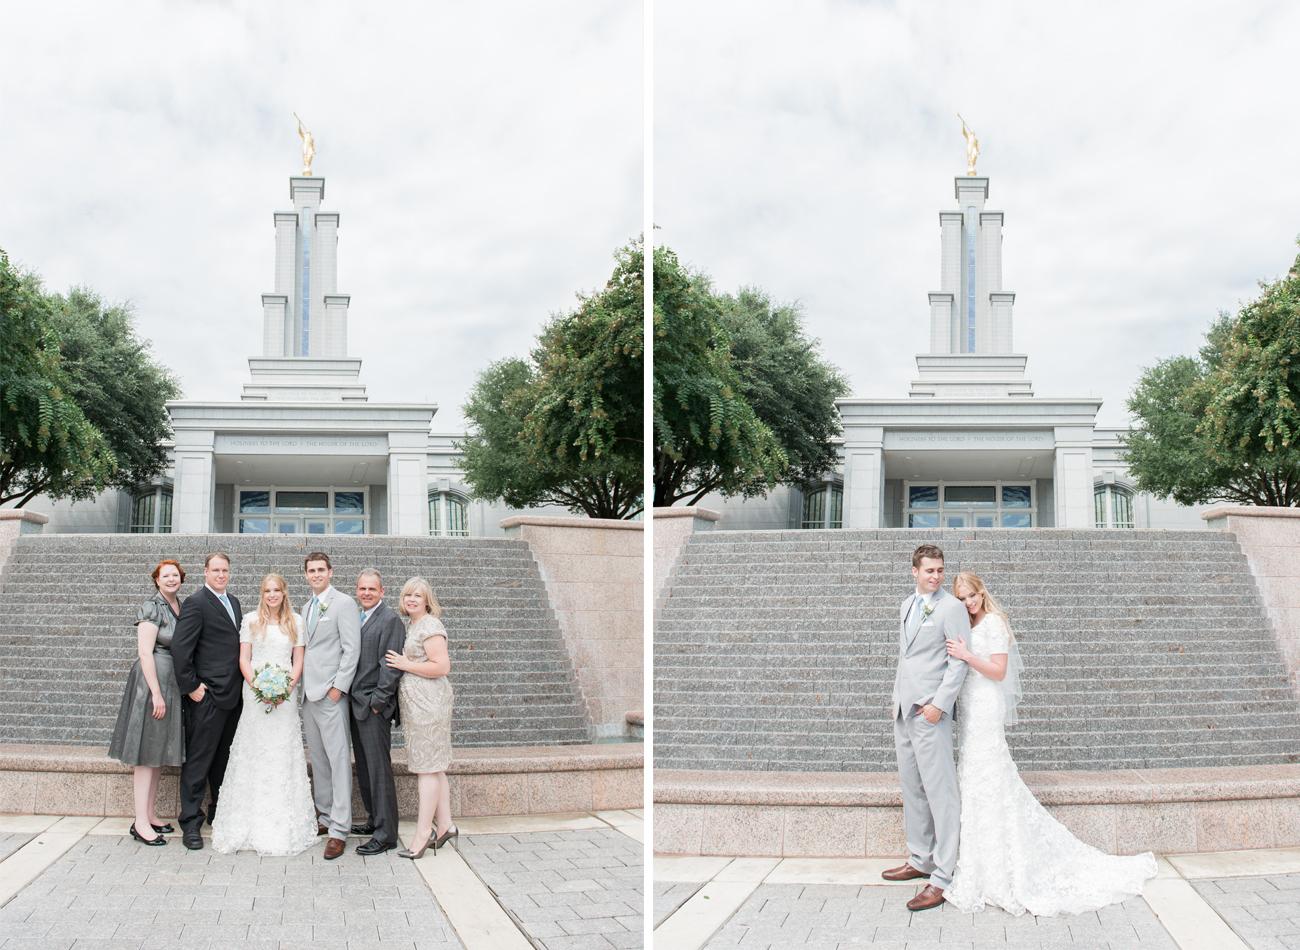 Rebekah and Brian | San Antonio LDS Wedding Photographer-5.5